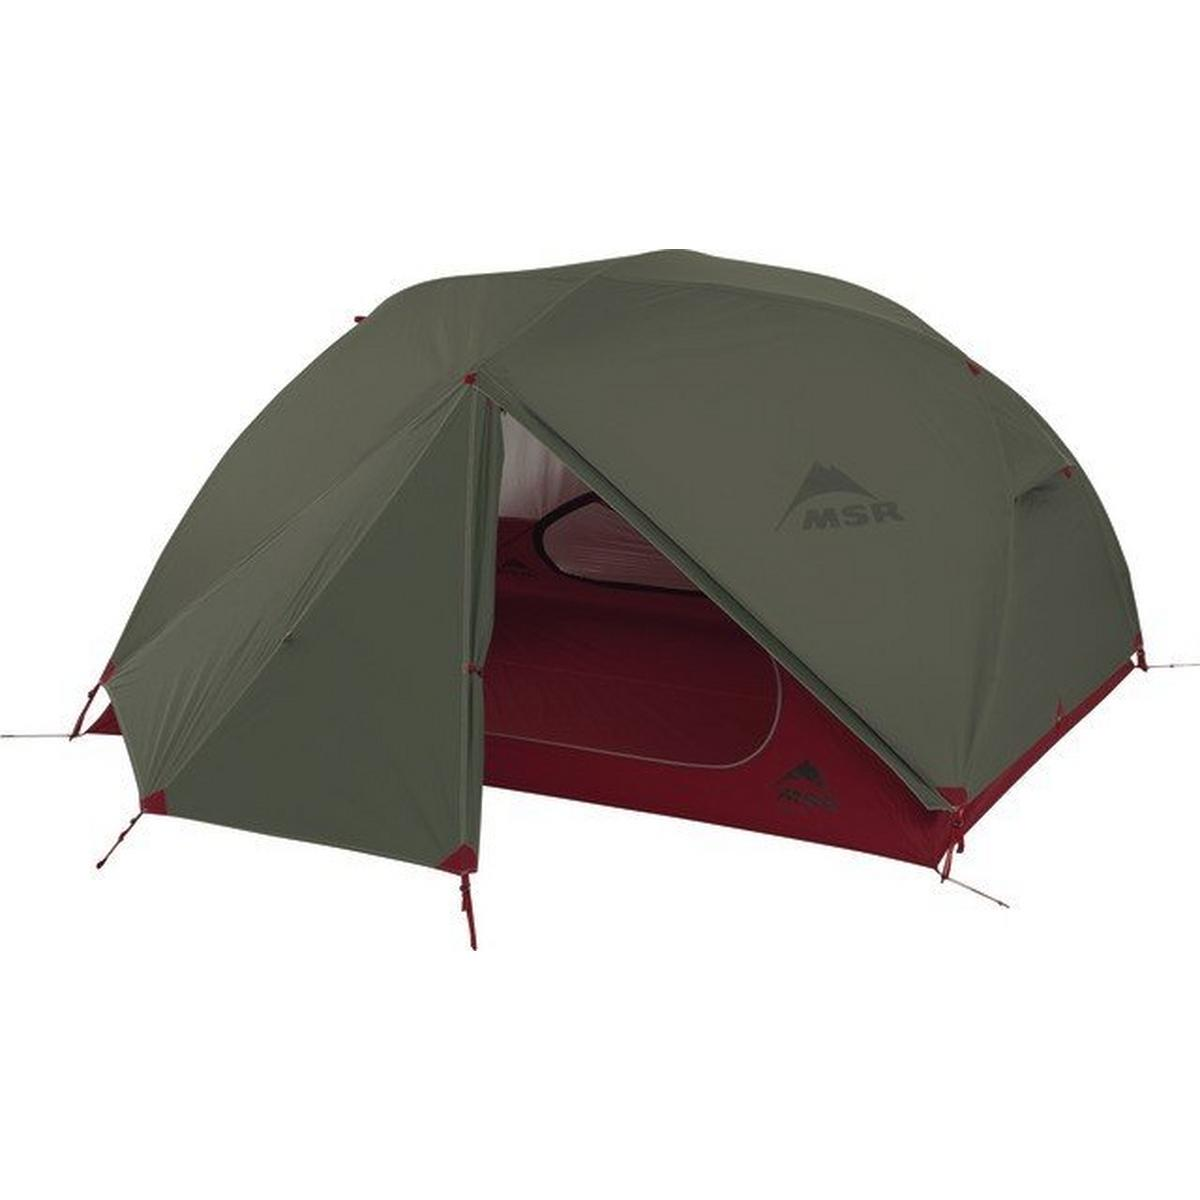 M.s.r. MSR Elixir 3 Person Tent - Green